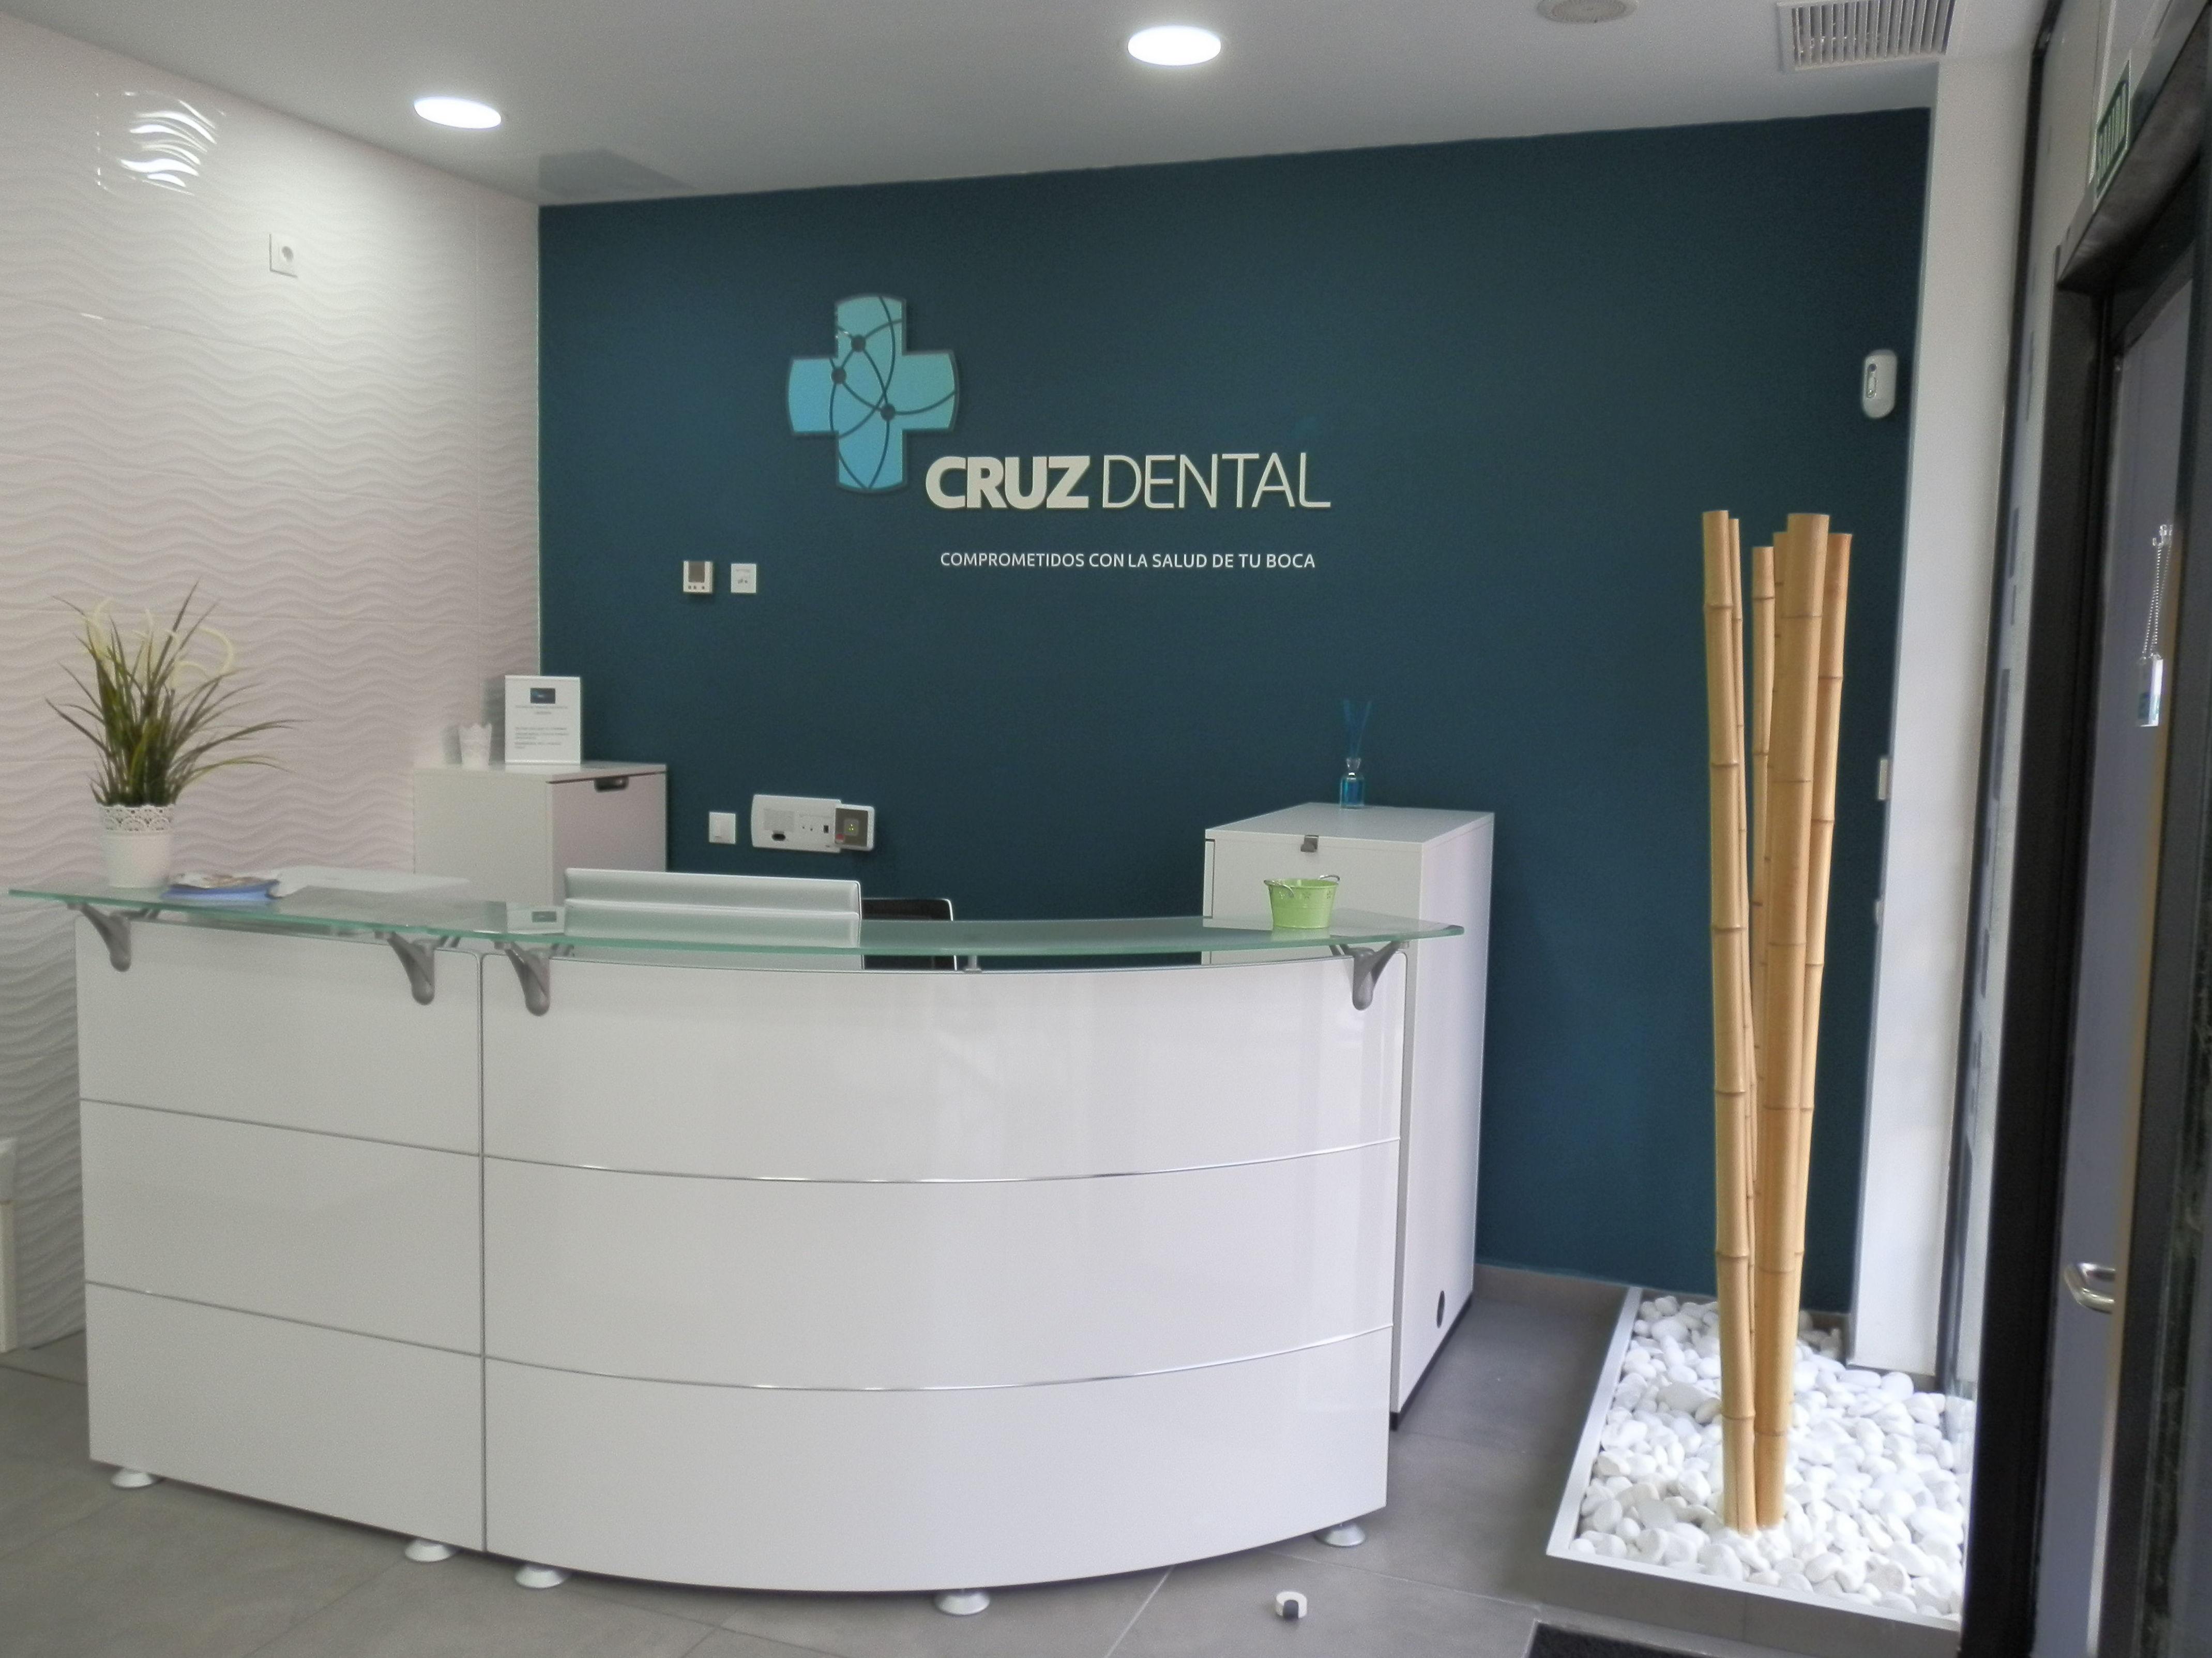 Cruz Dental, Tenerife